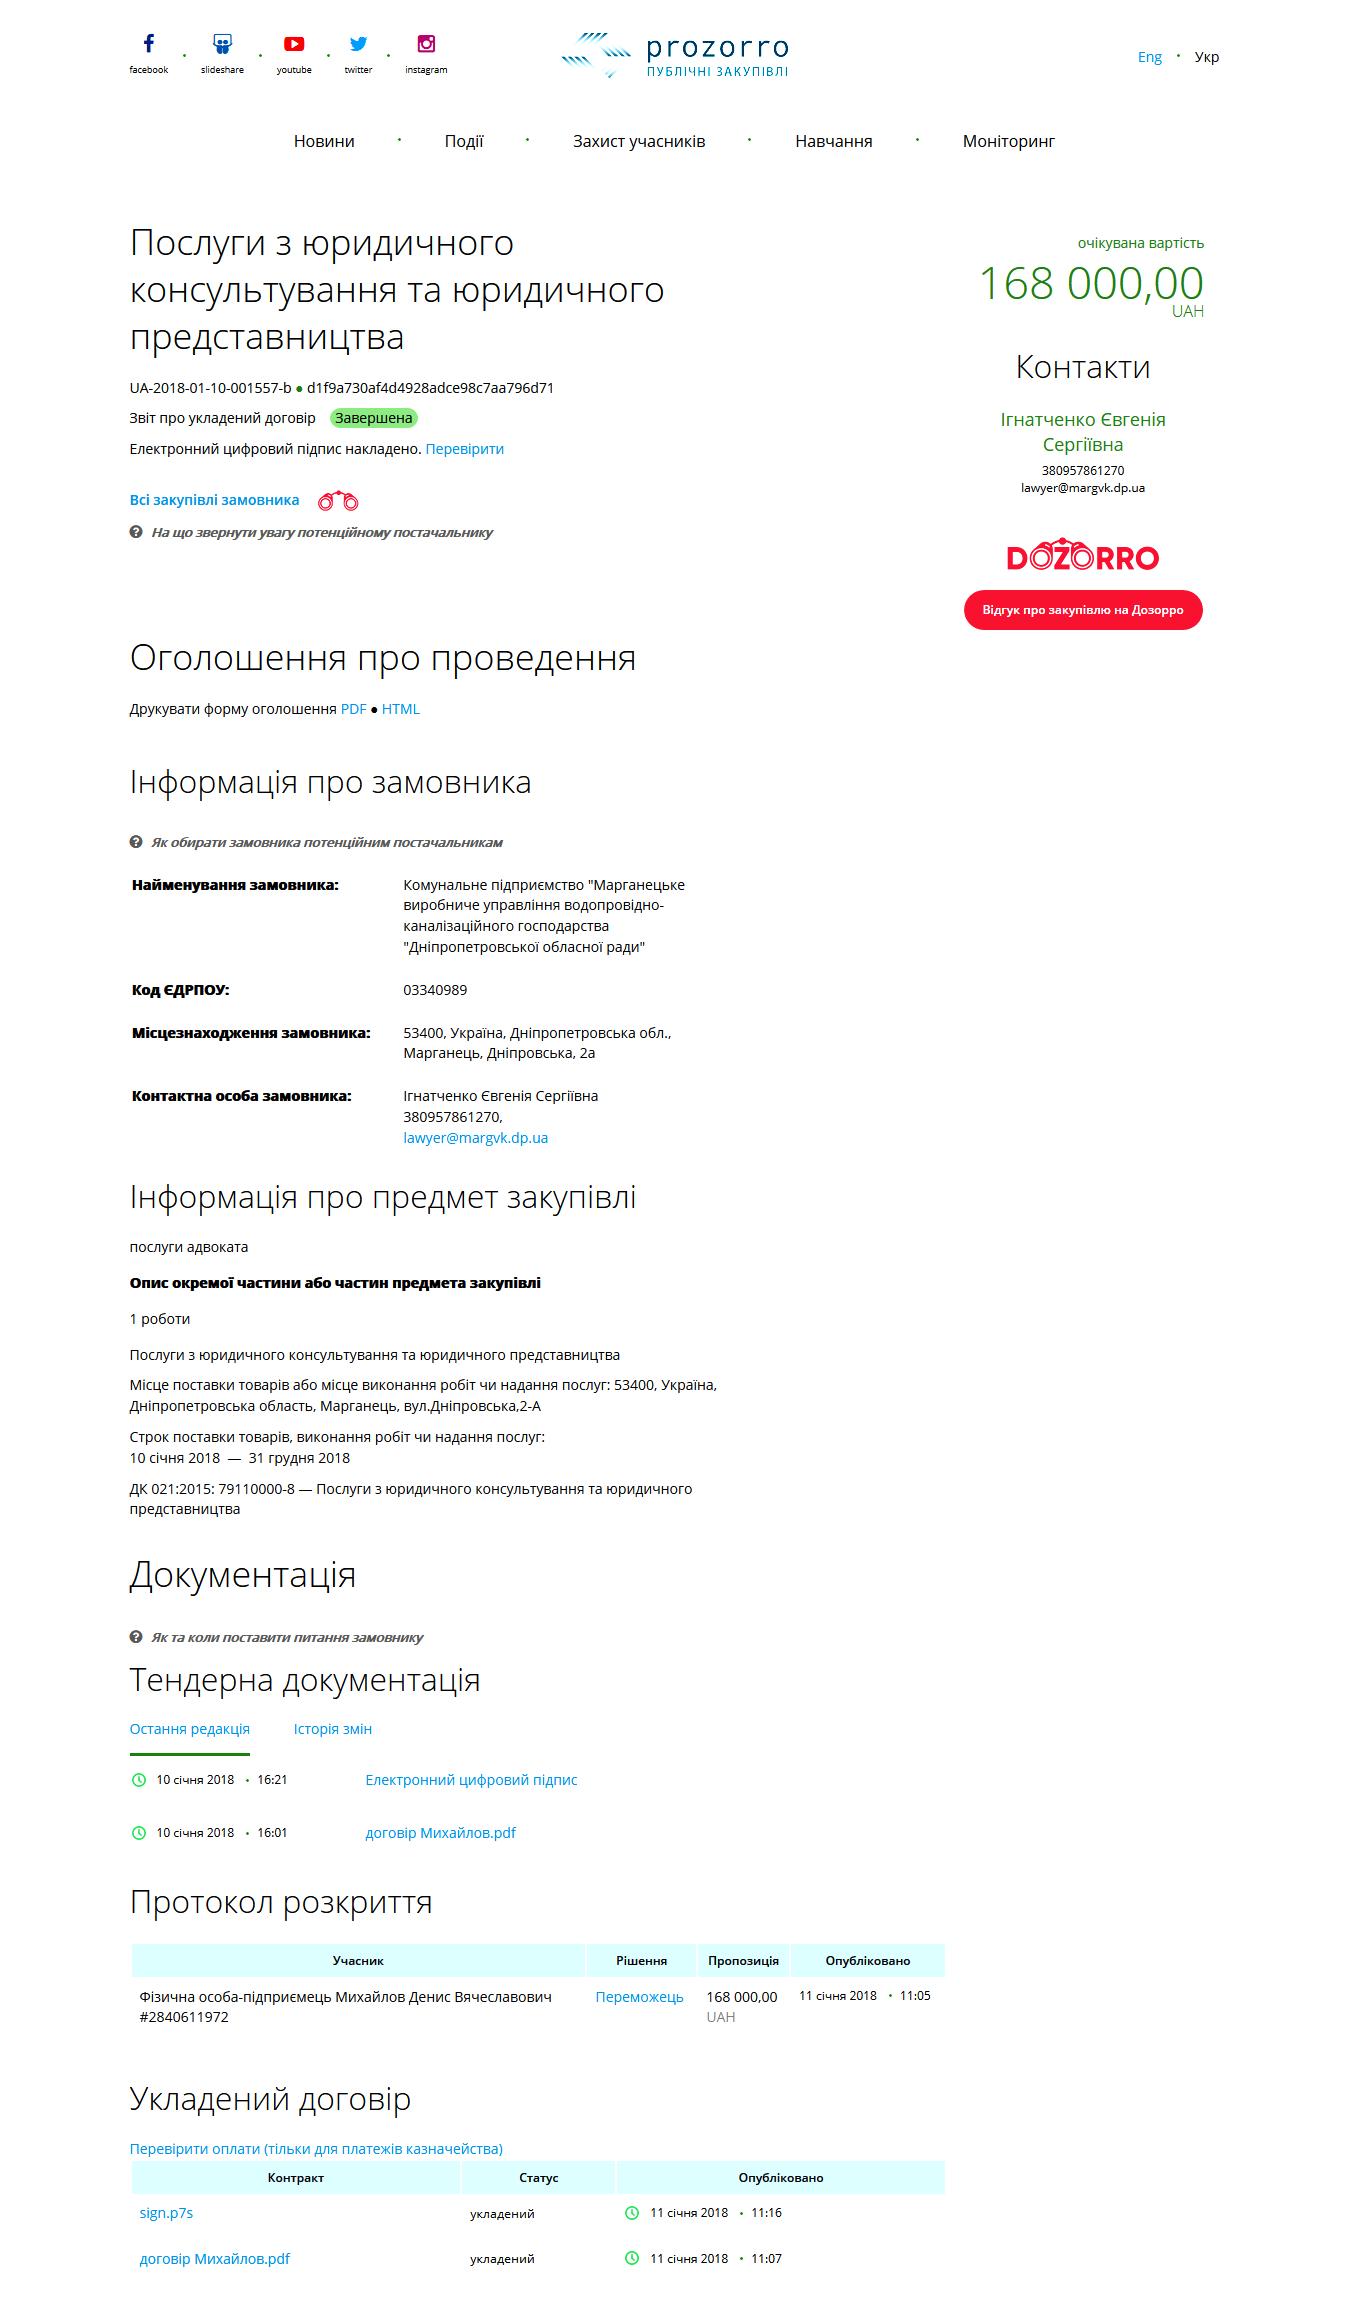 Screenshot_2018-07-20 Послуги з юридичного консультування та юридичного представництва